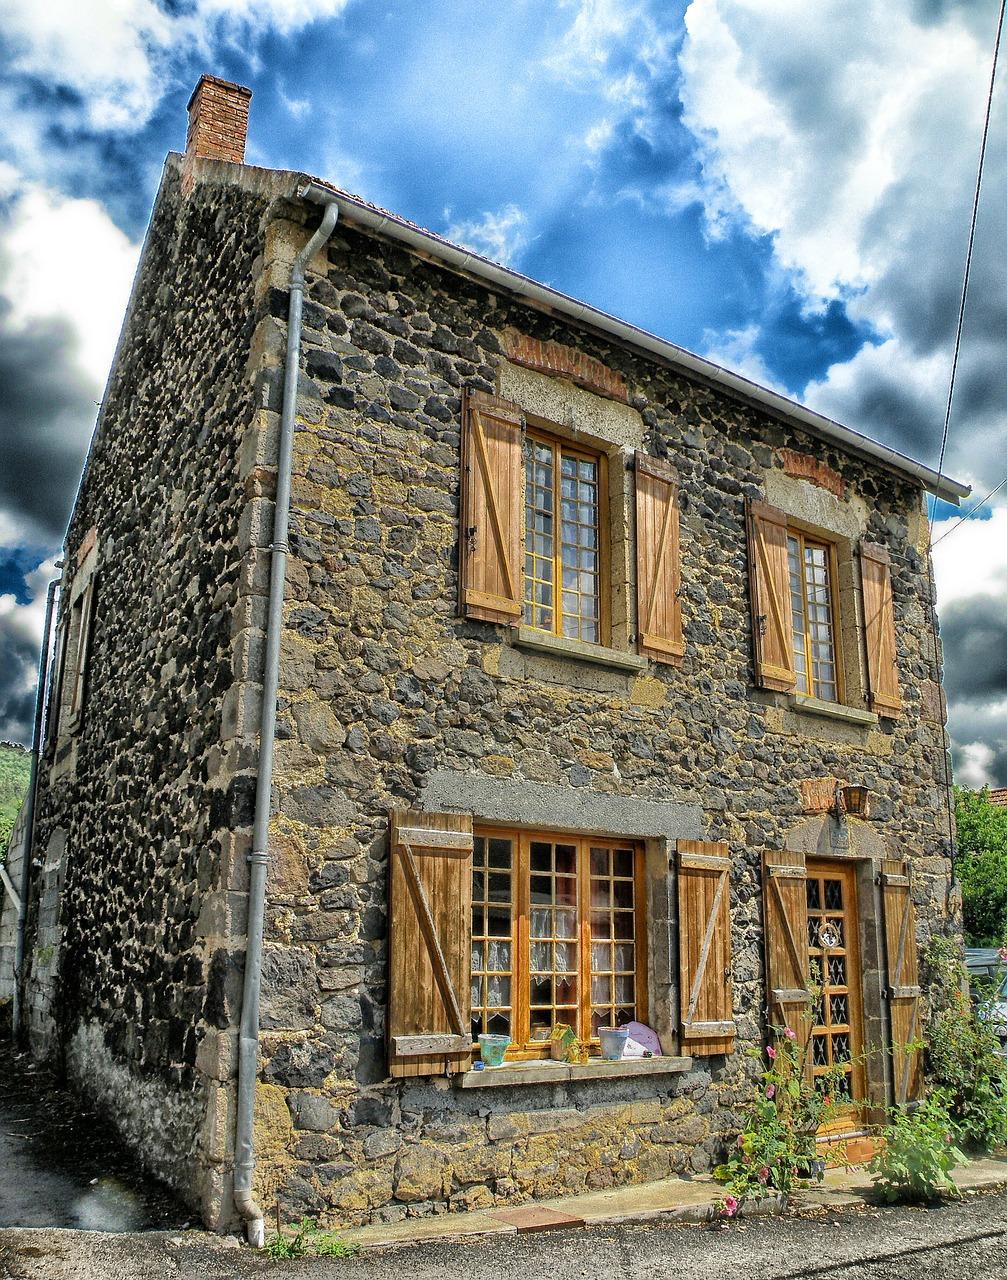 fotos-de-casas-de-piedra-antiguas